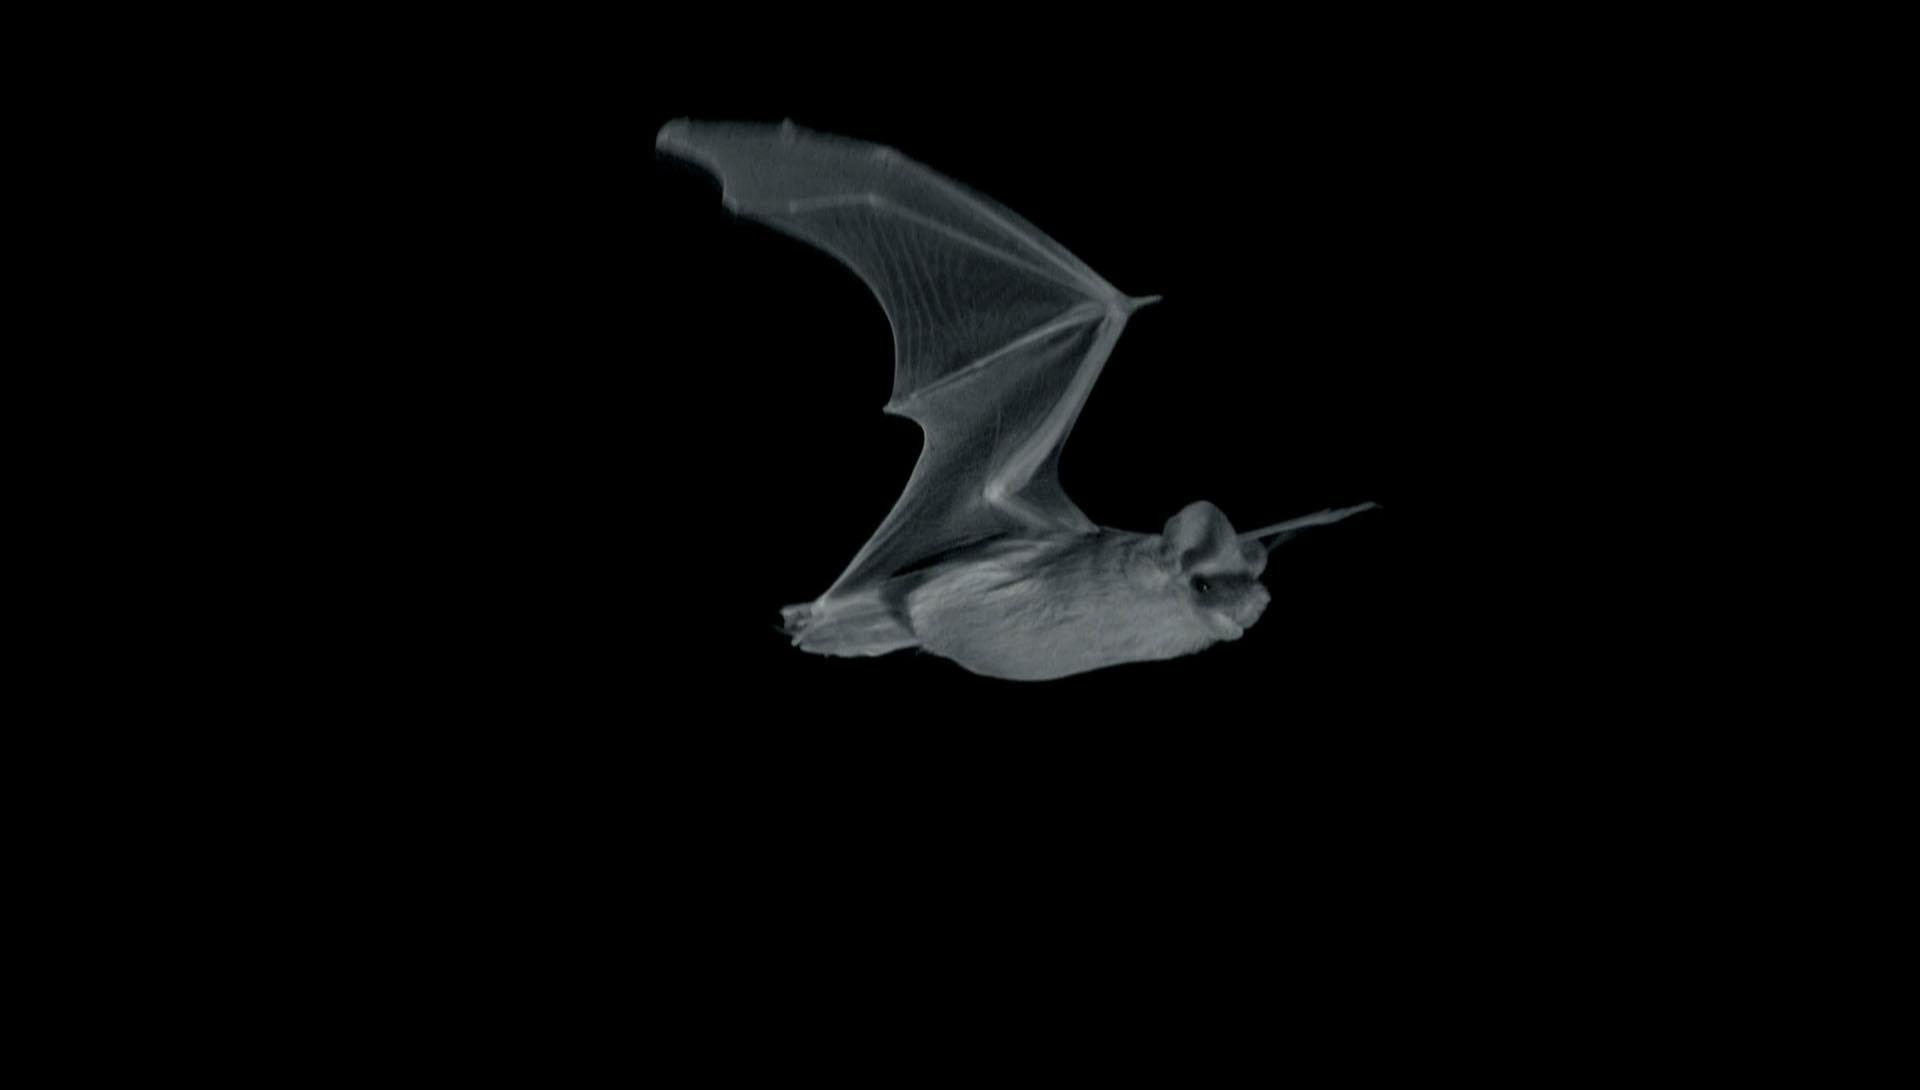 Bat vs Moth: A Nighttime Arms Race